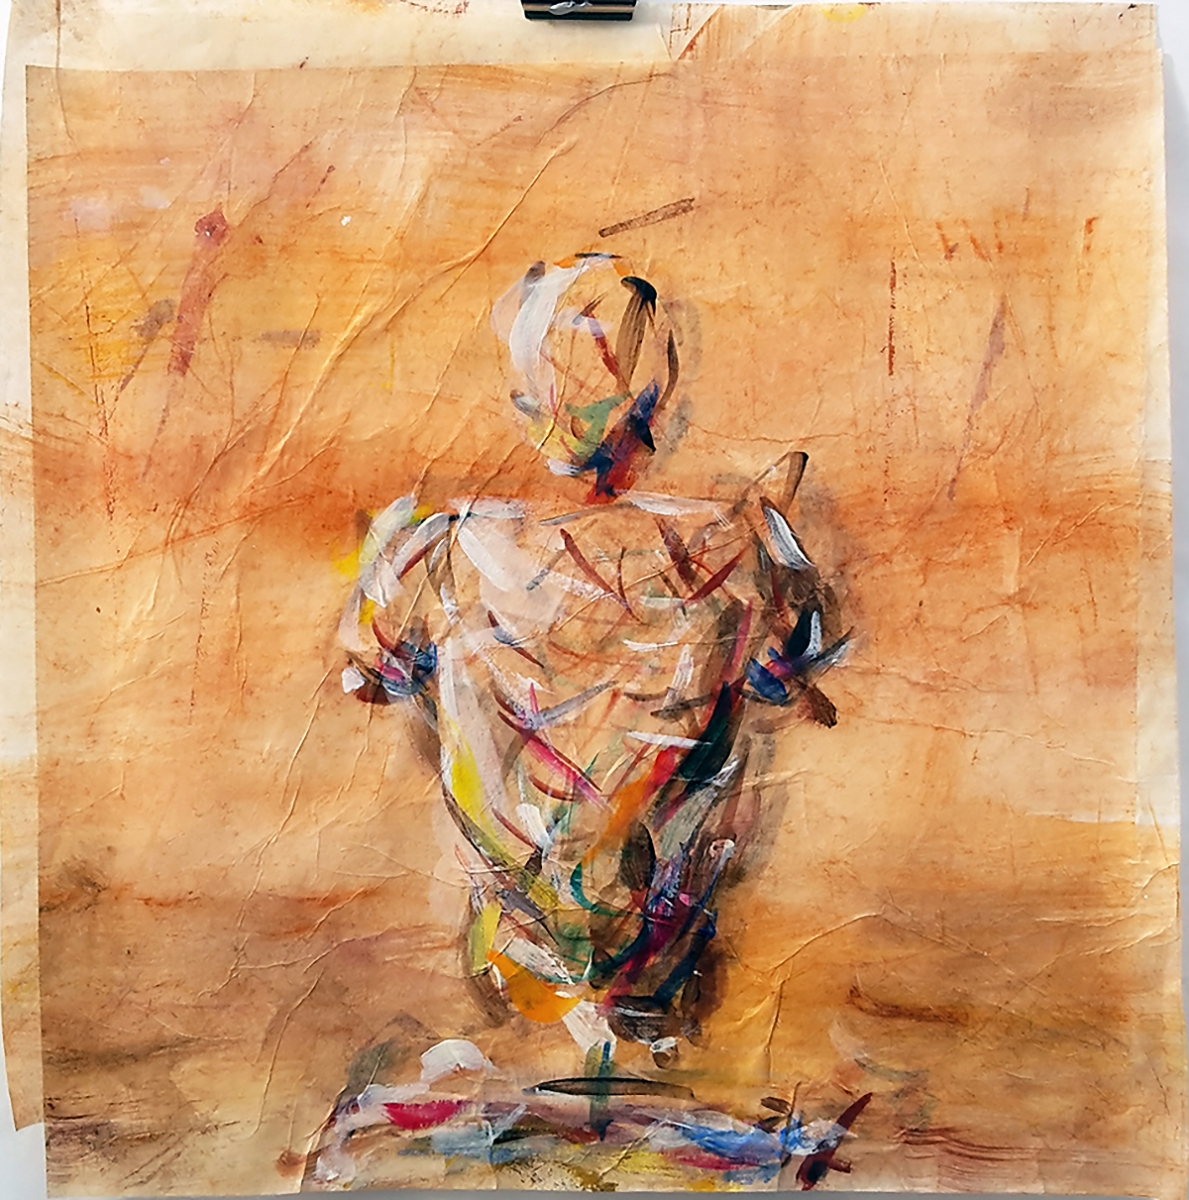 Wächter #01 (Serie Kafka/ Vor dem Gesetz) // 30 x25, Acryl auf Seidenpapier, 2018